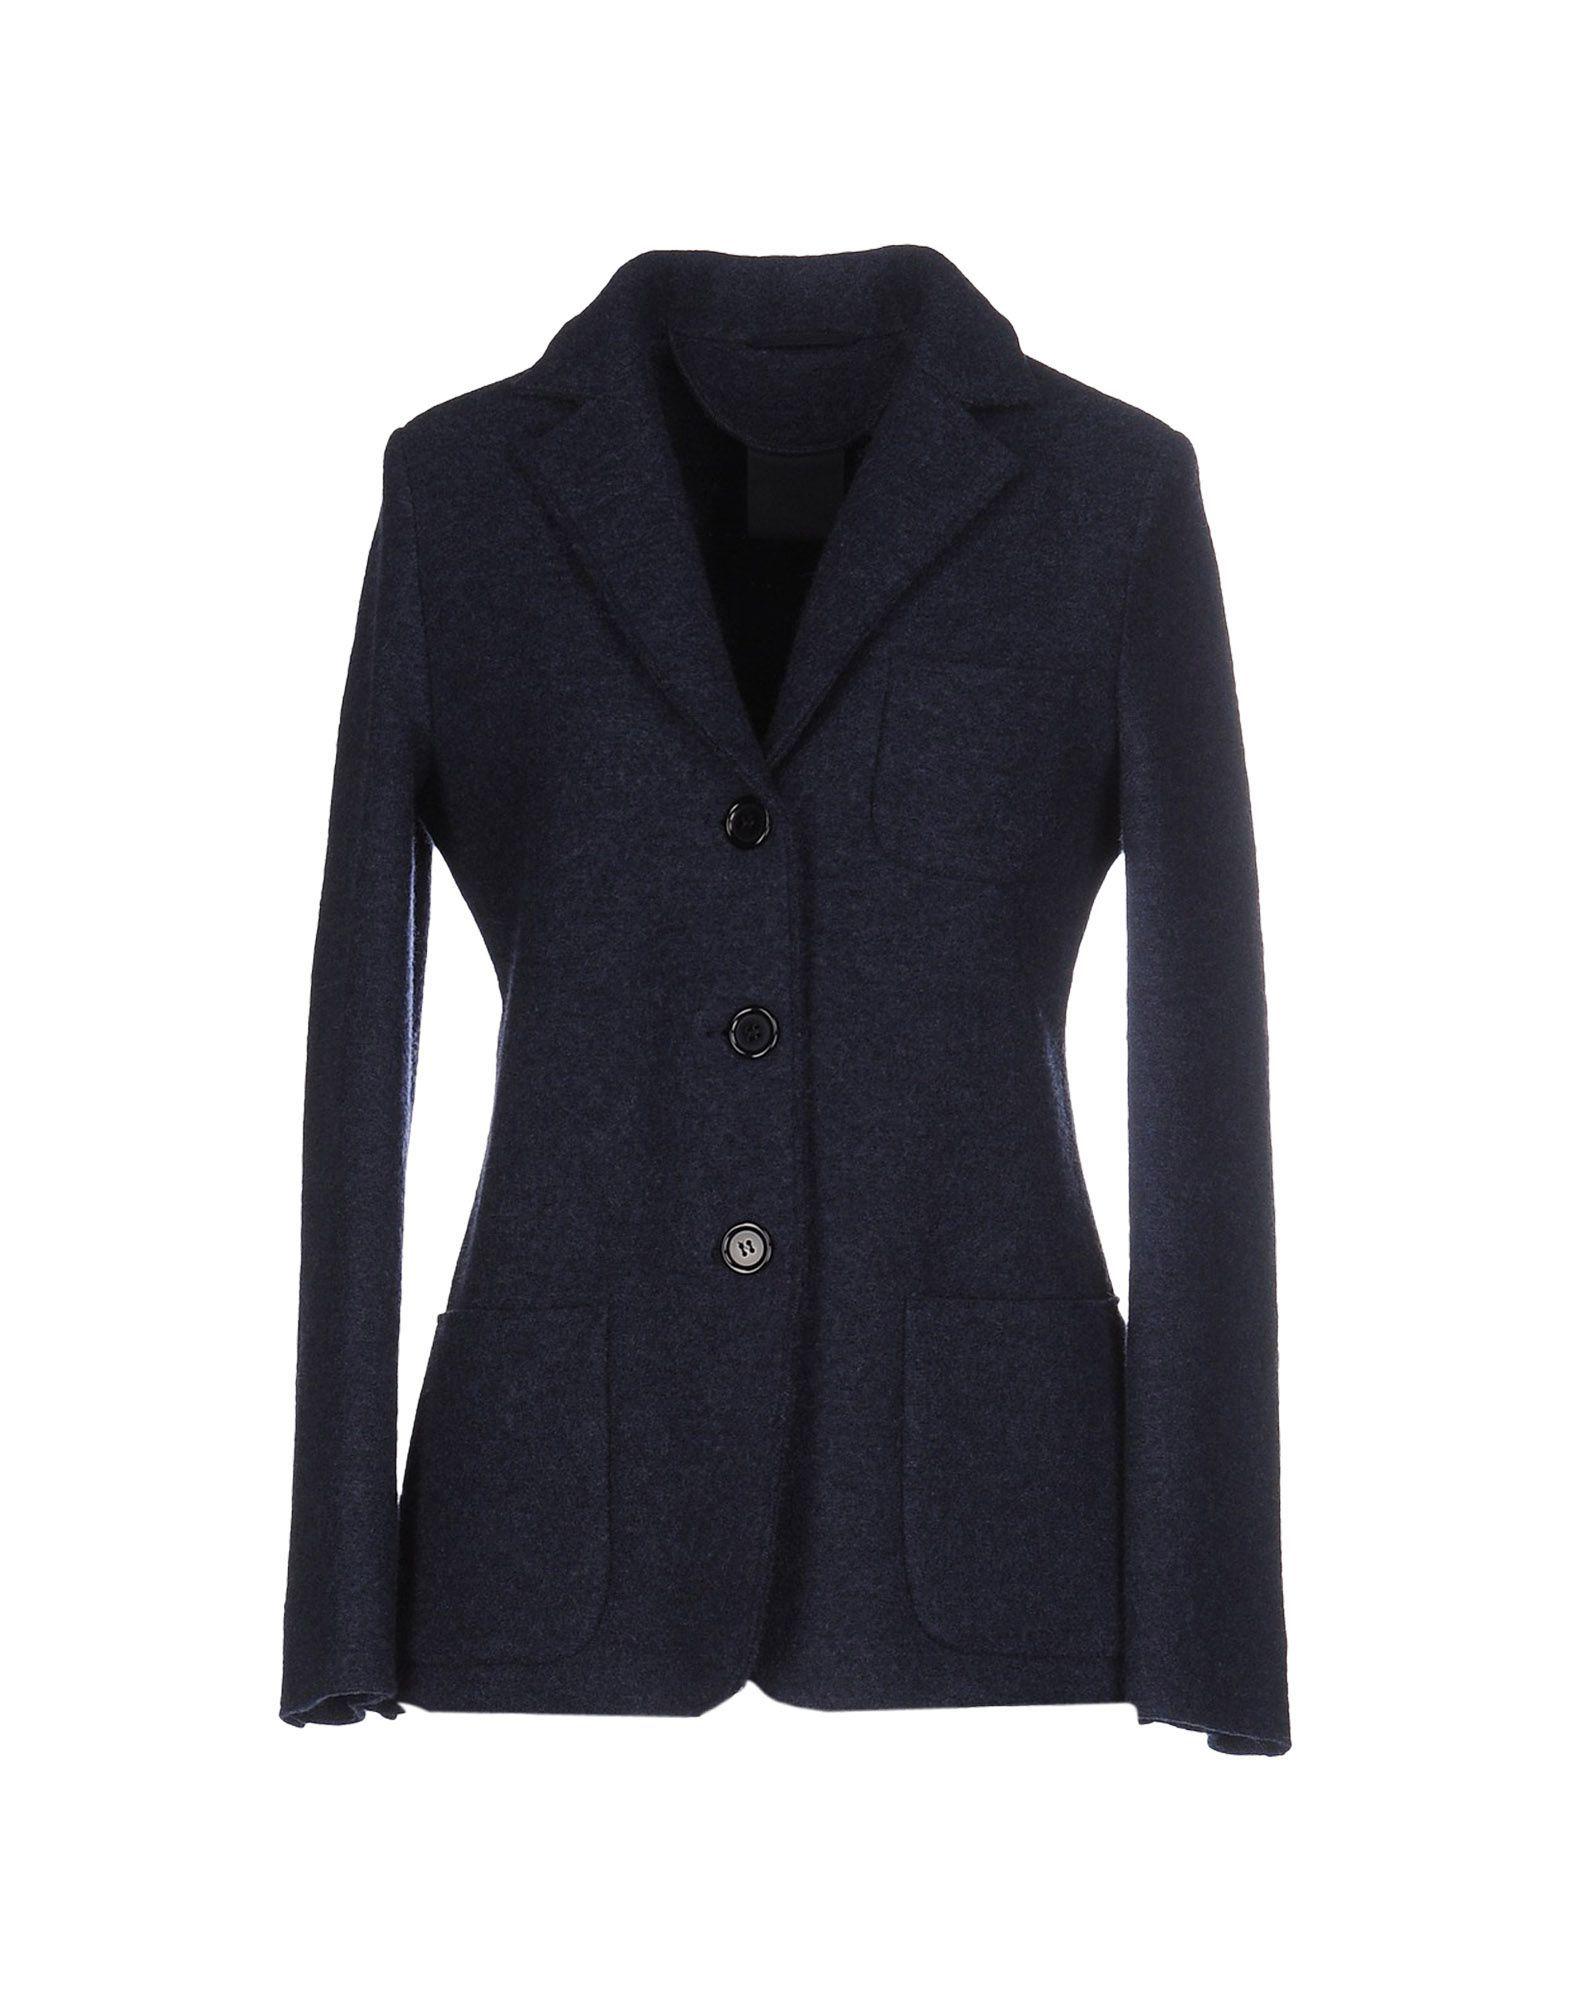 Aspesi Dark Blue Wool Single Breasted Blazer